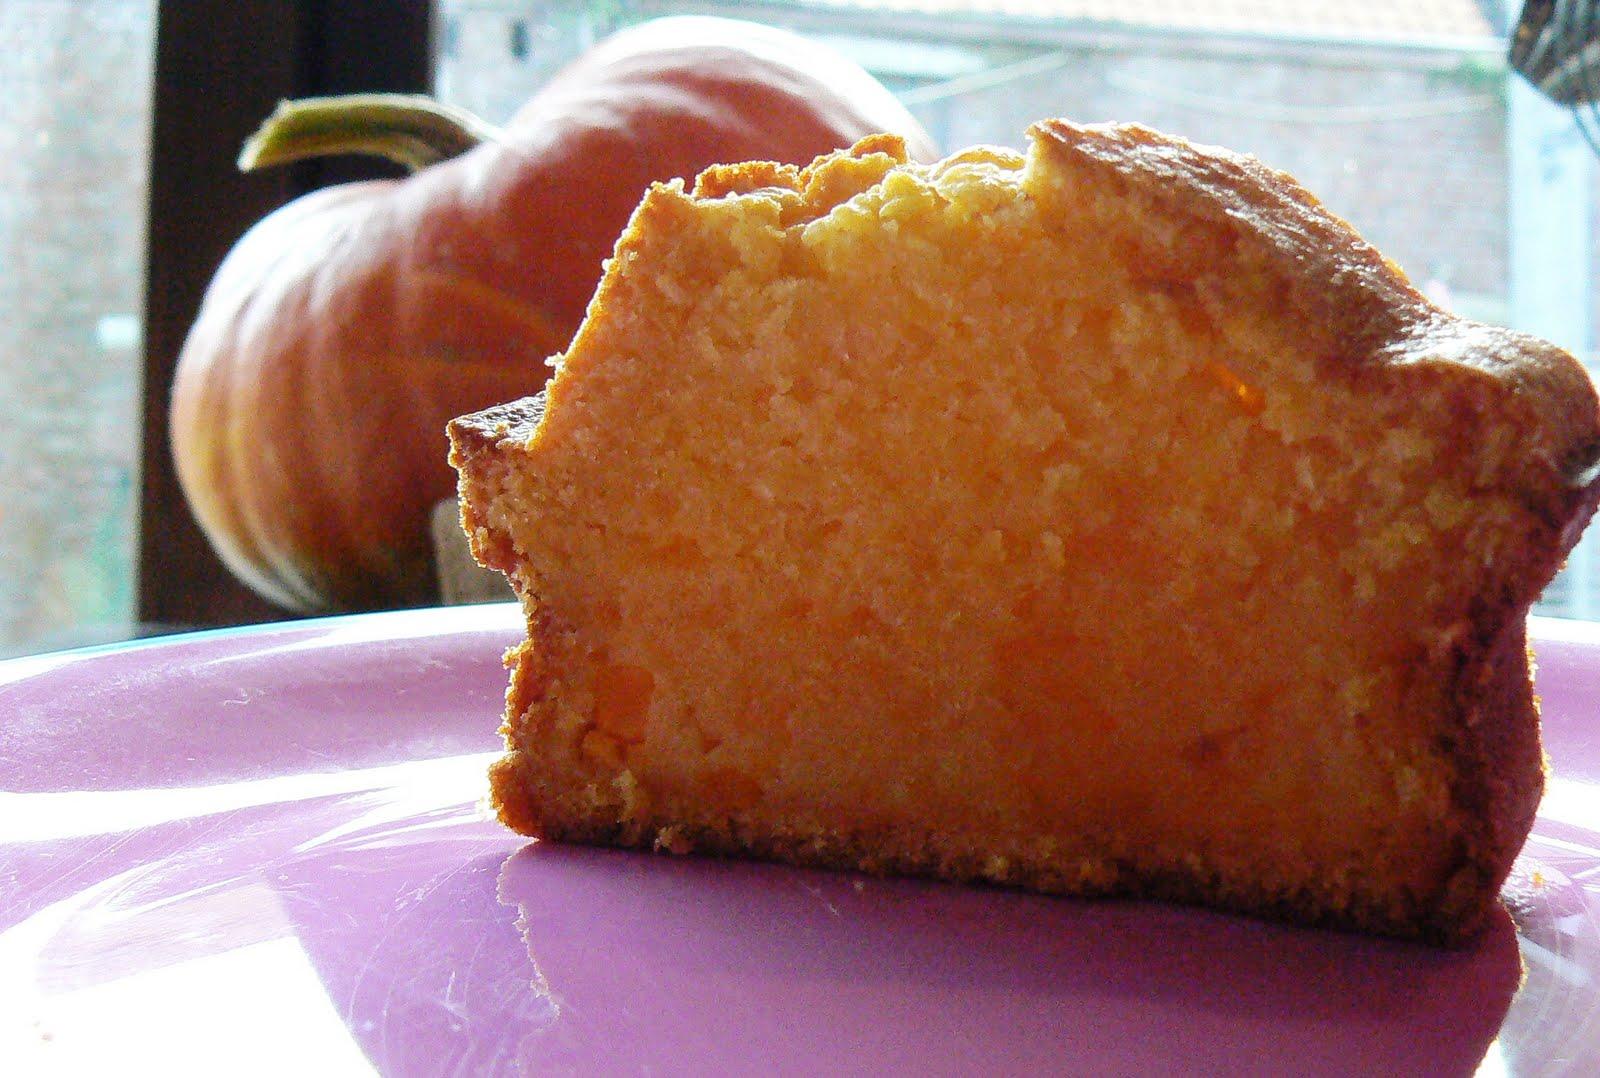 Cuisinecosmos cake au potiron et noisettes - Cake au potiron sucre ...